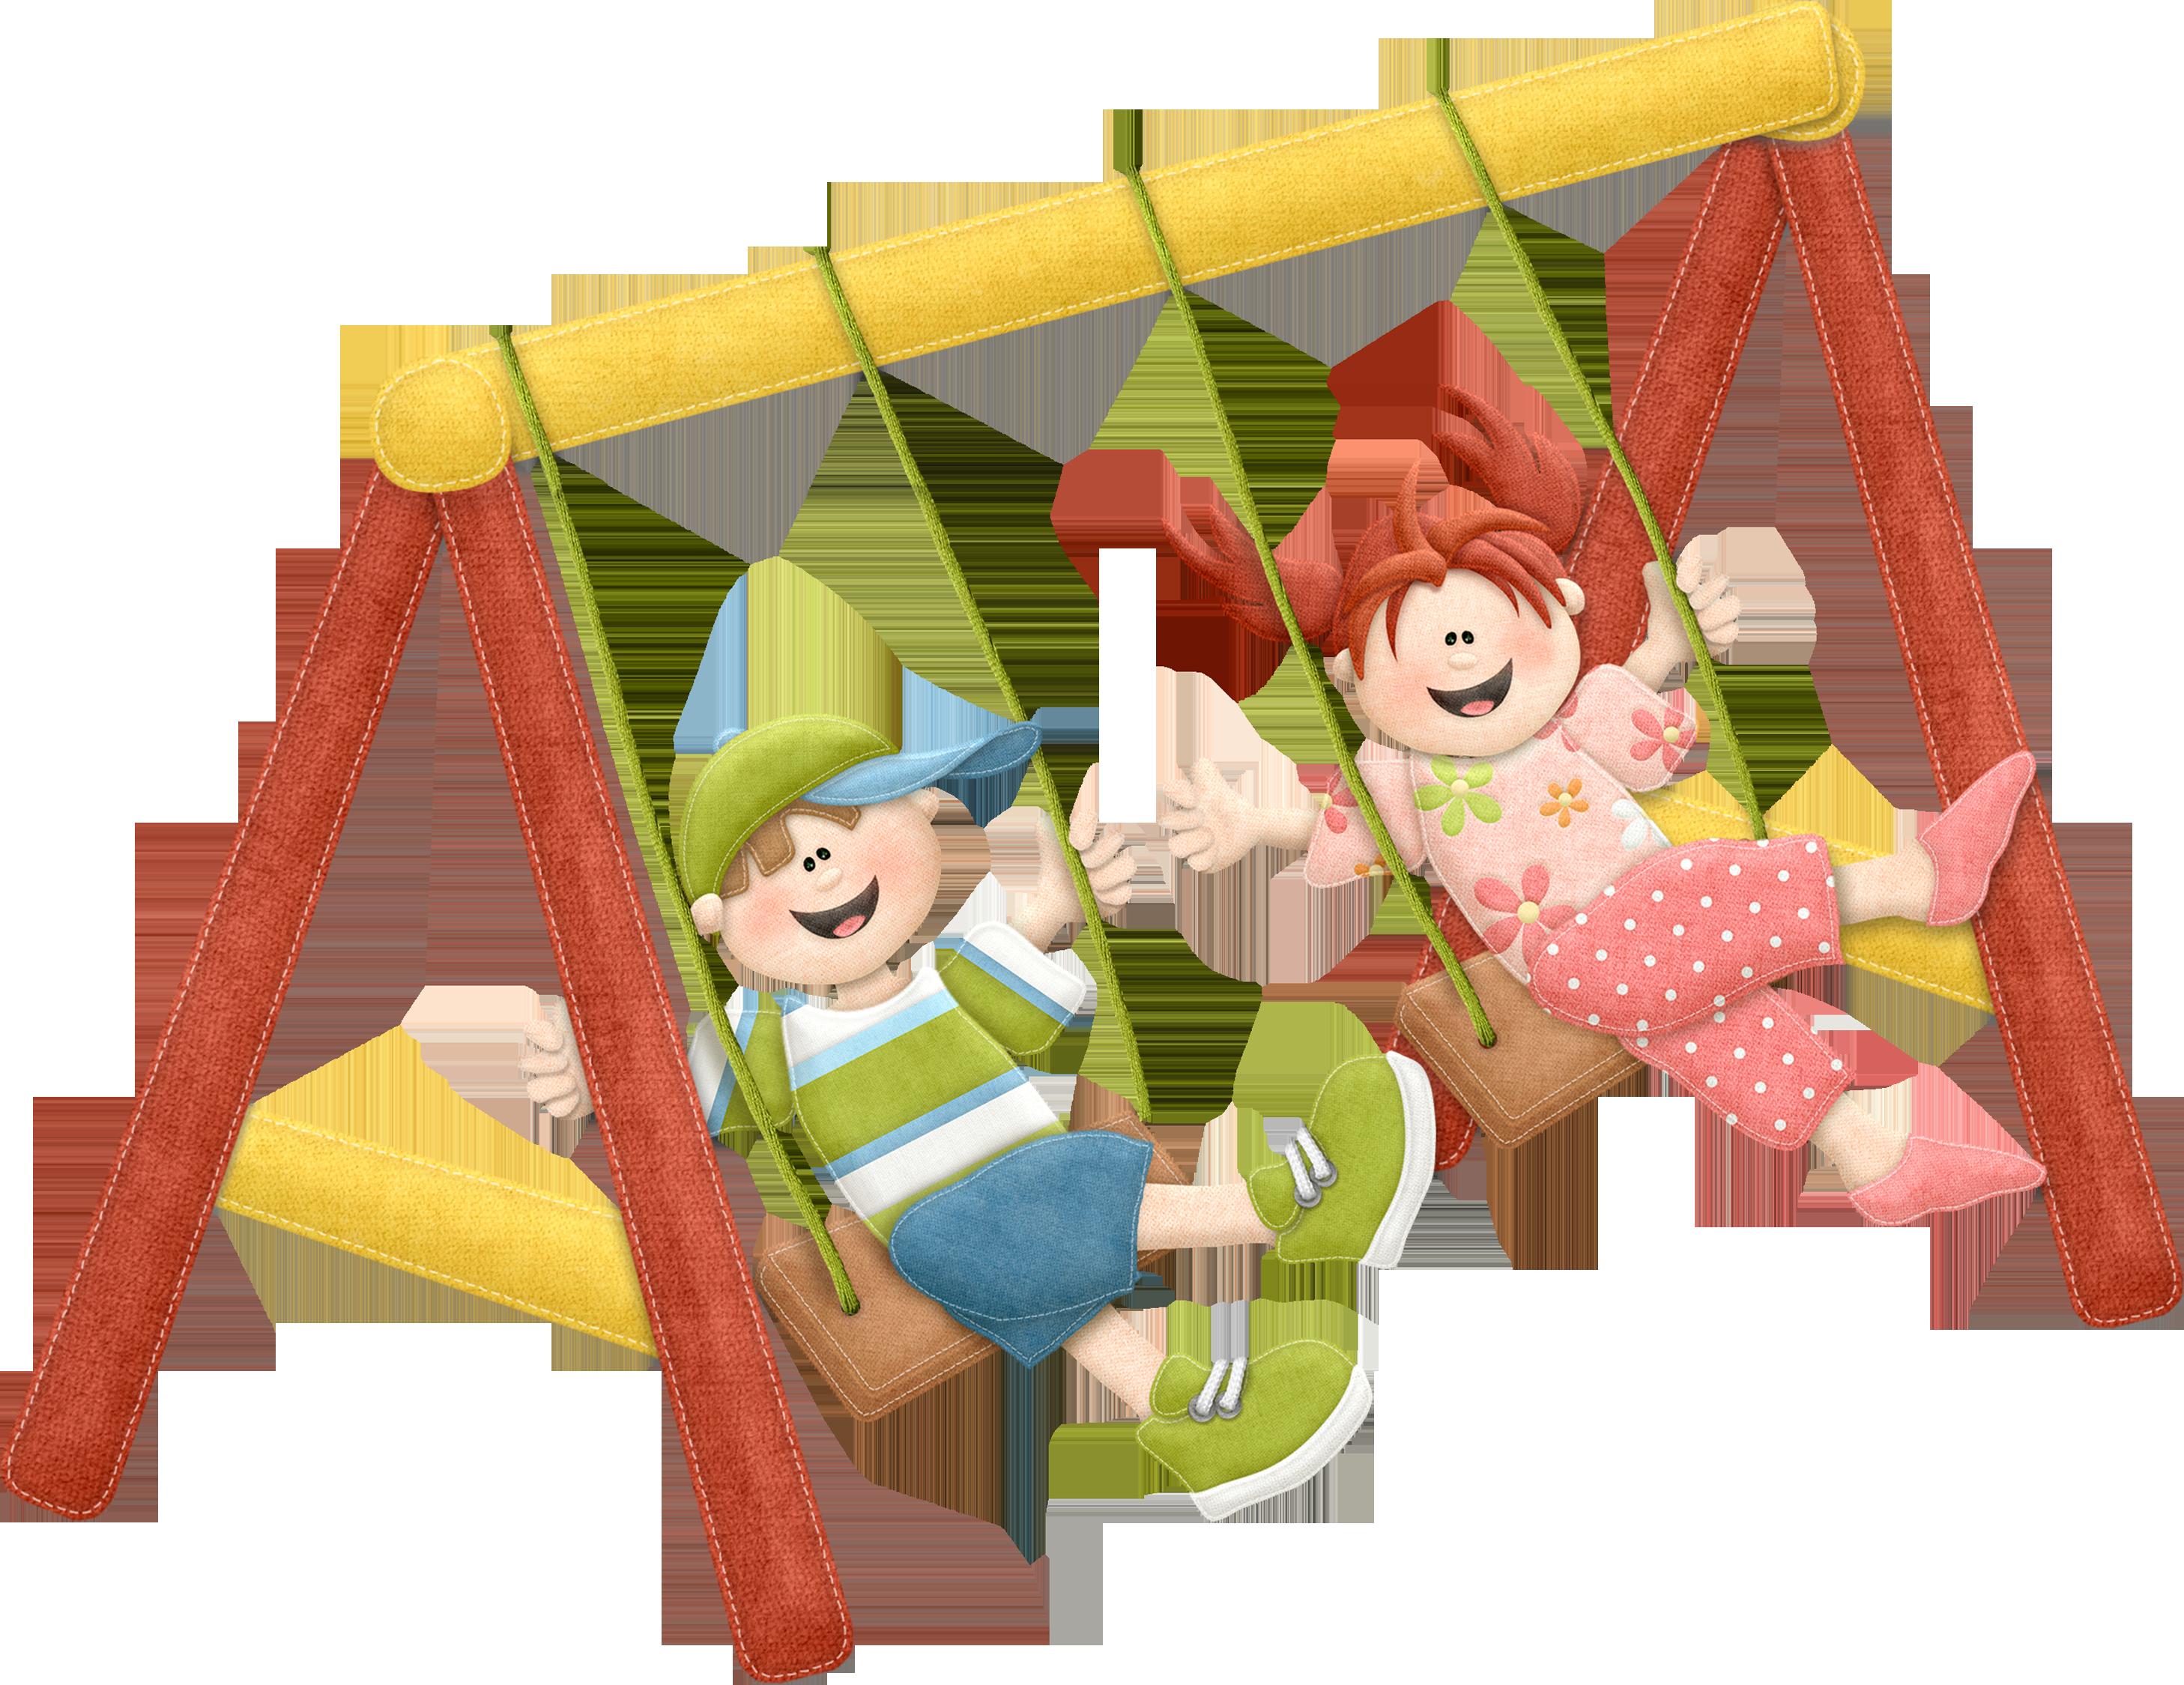 School playground clipart clip art freeuse download Photo by @selmabuenoaltran - Minus | Clipart | Pinterest | Clip art ... clip art freeuse download